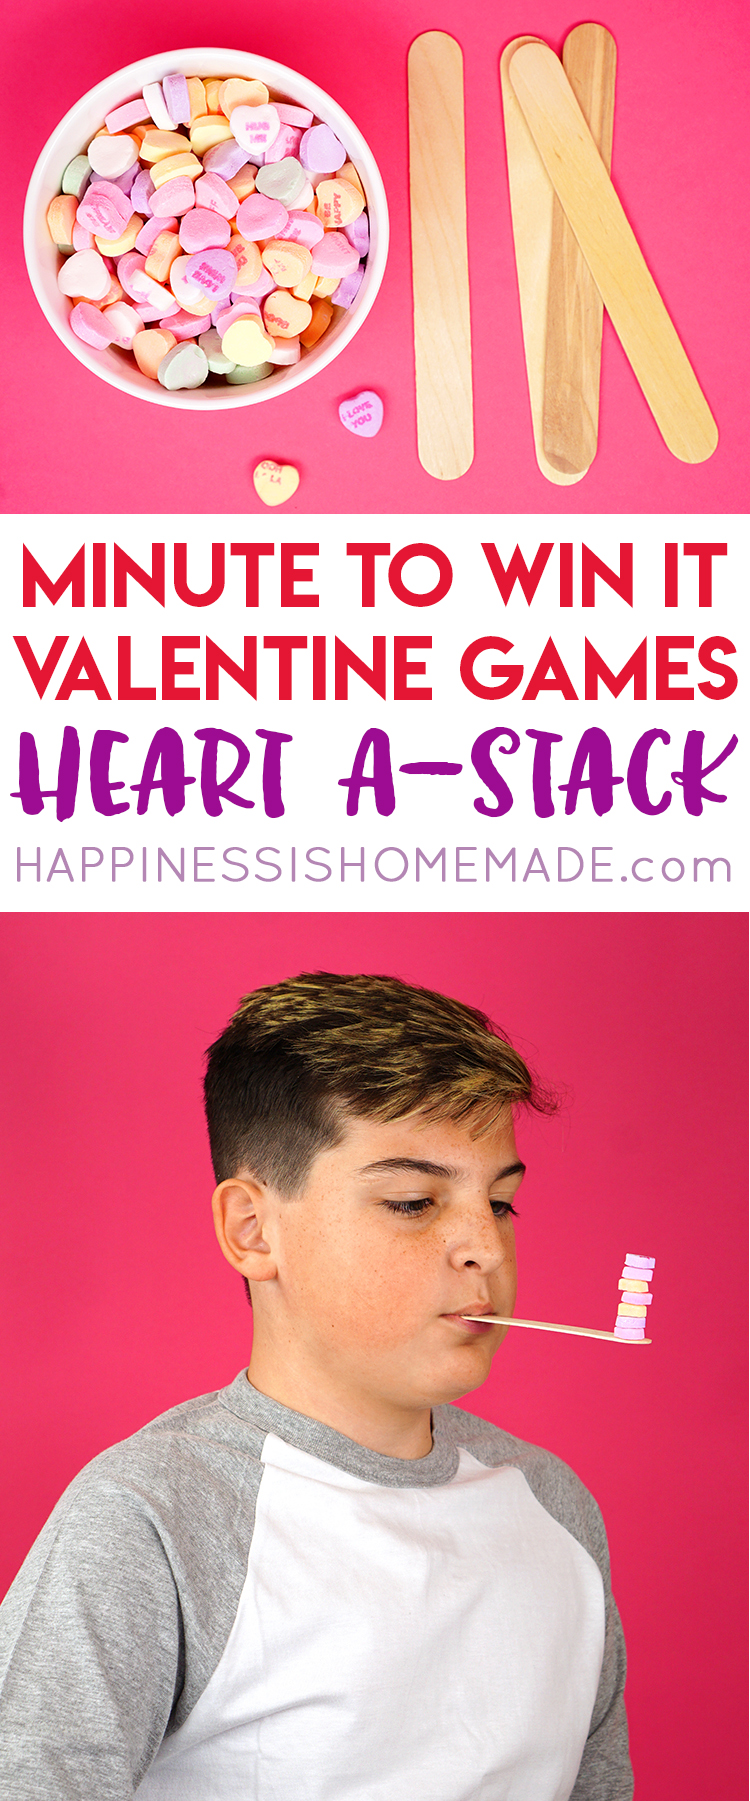 fun minute to win it valentine games